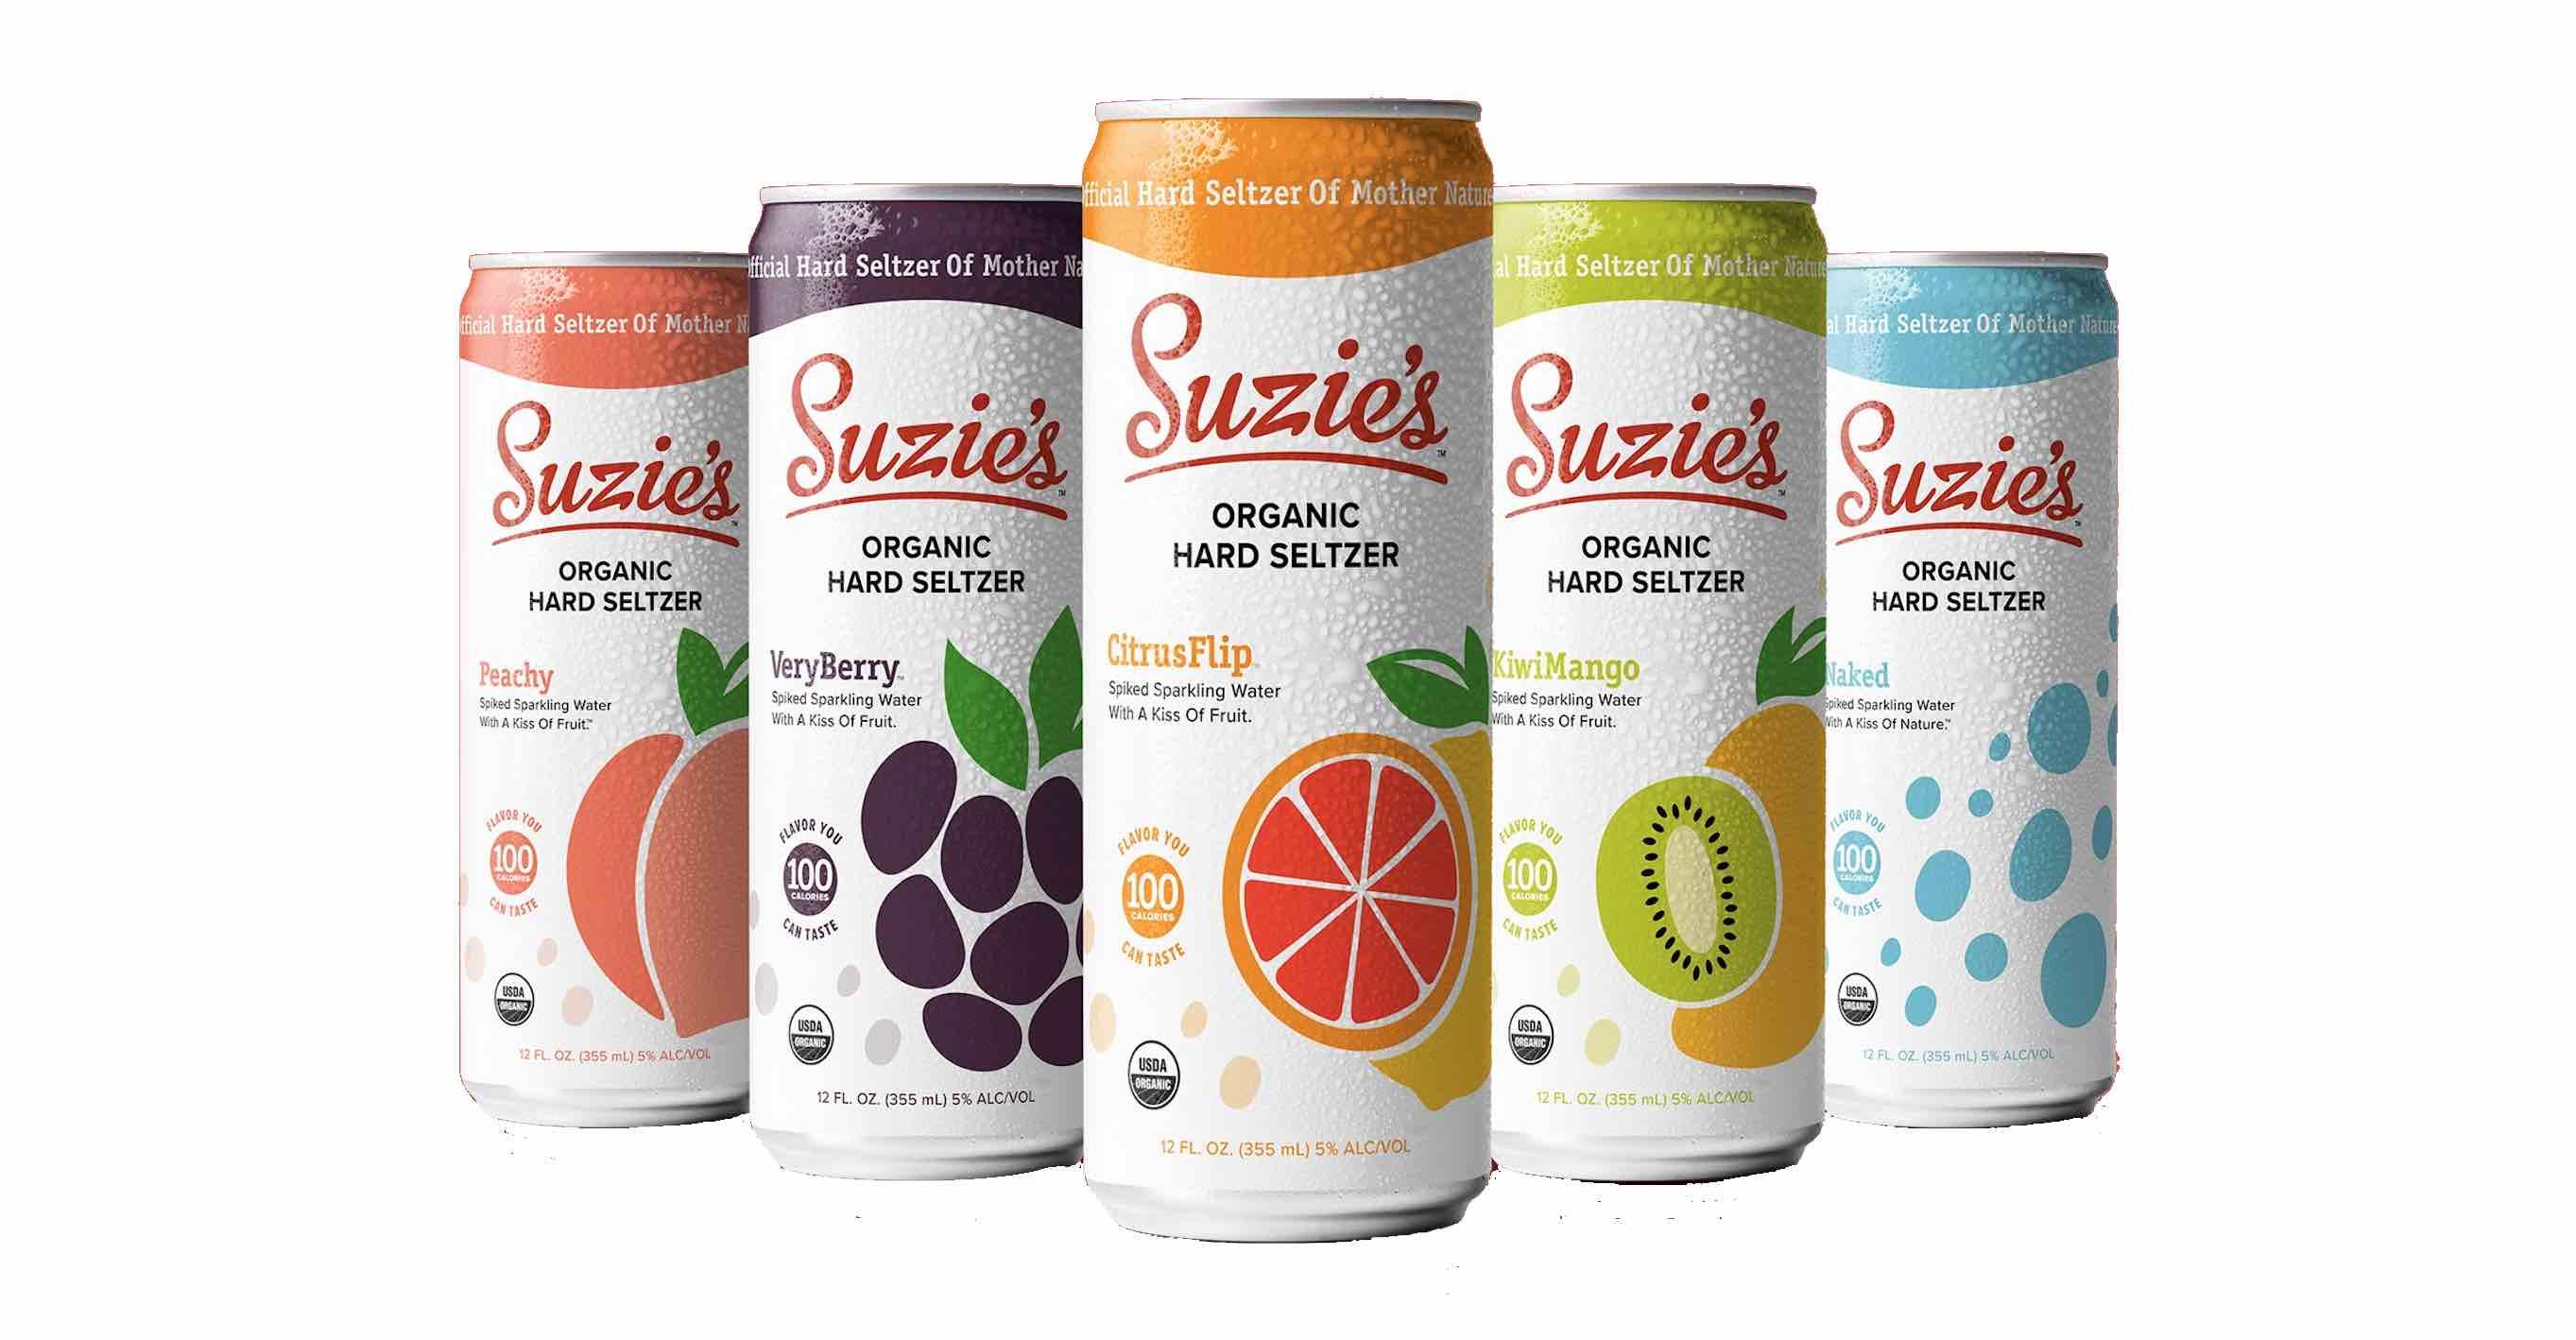 Suzie's Organic Hard Seltzer - Peachy, VeryBerry, CitrusFlip, KiwiMango, and Naked.